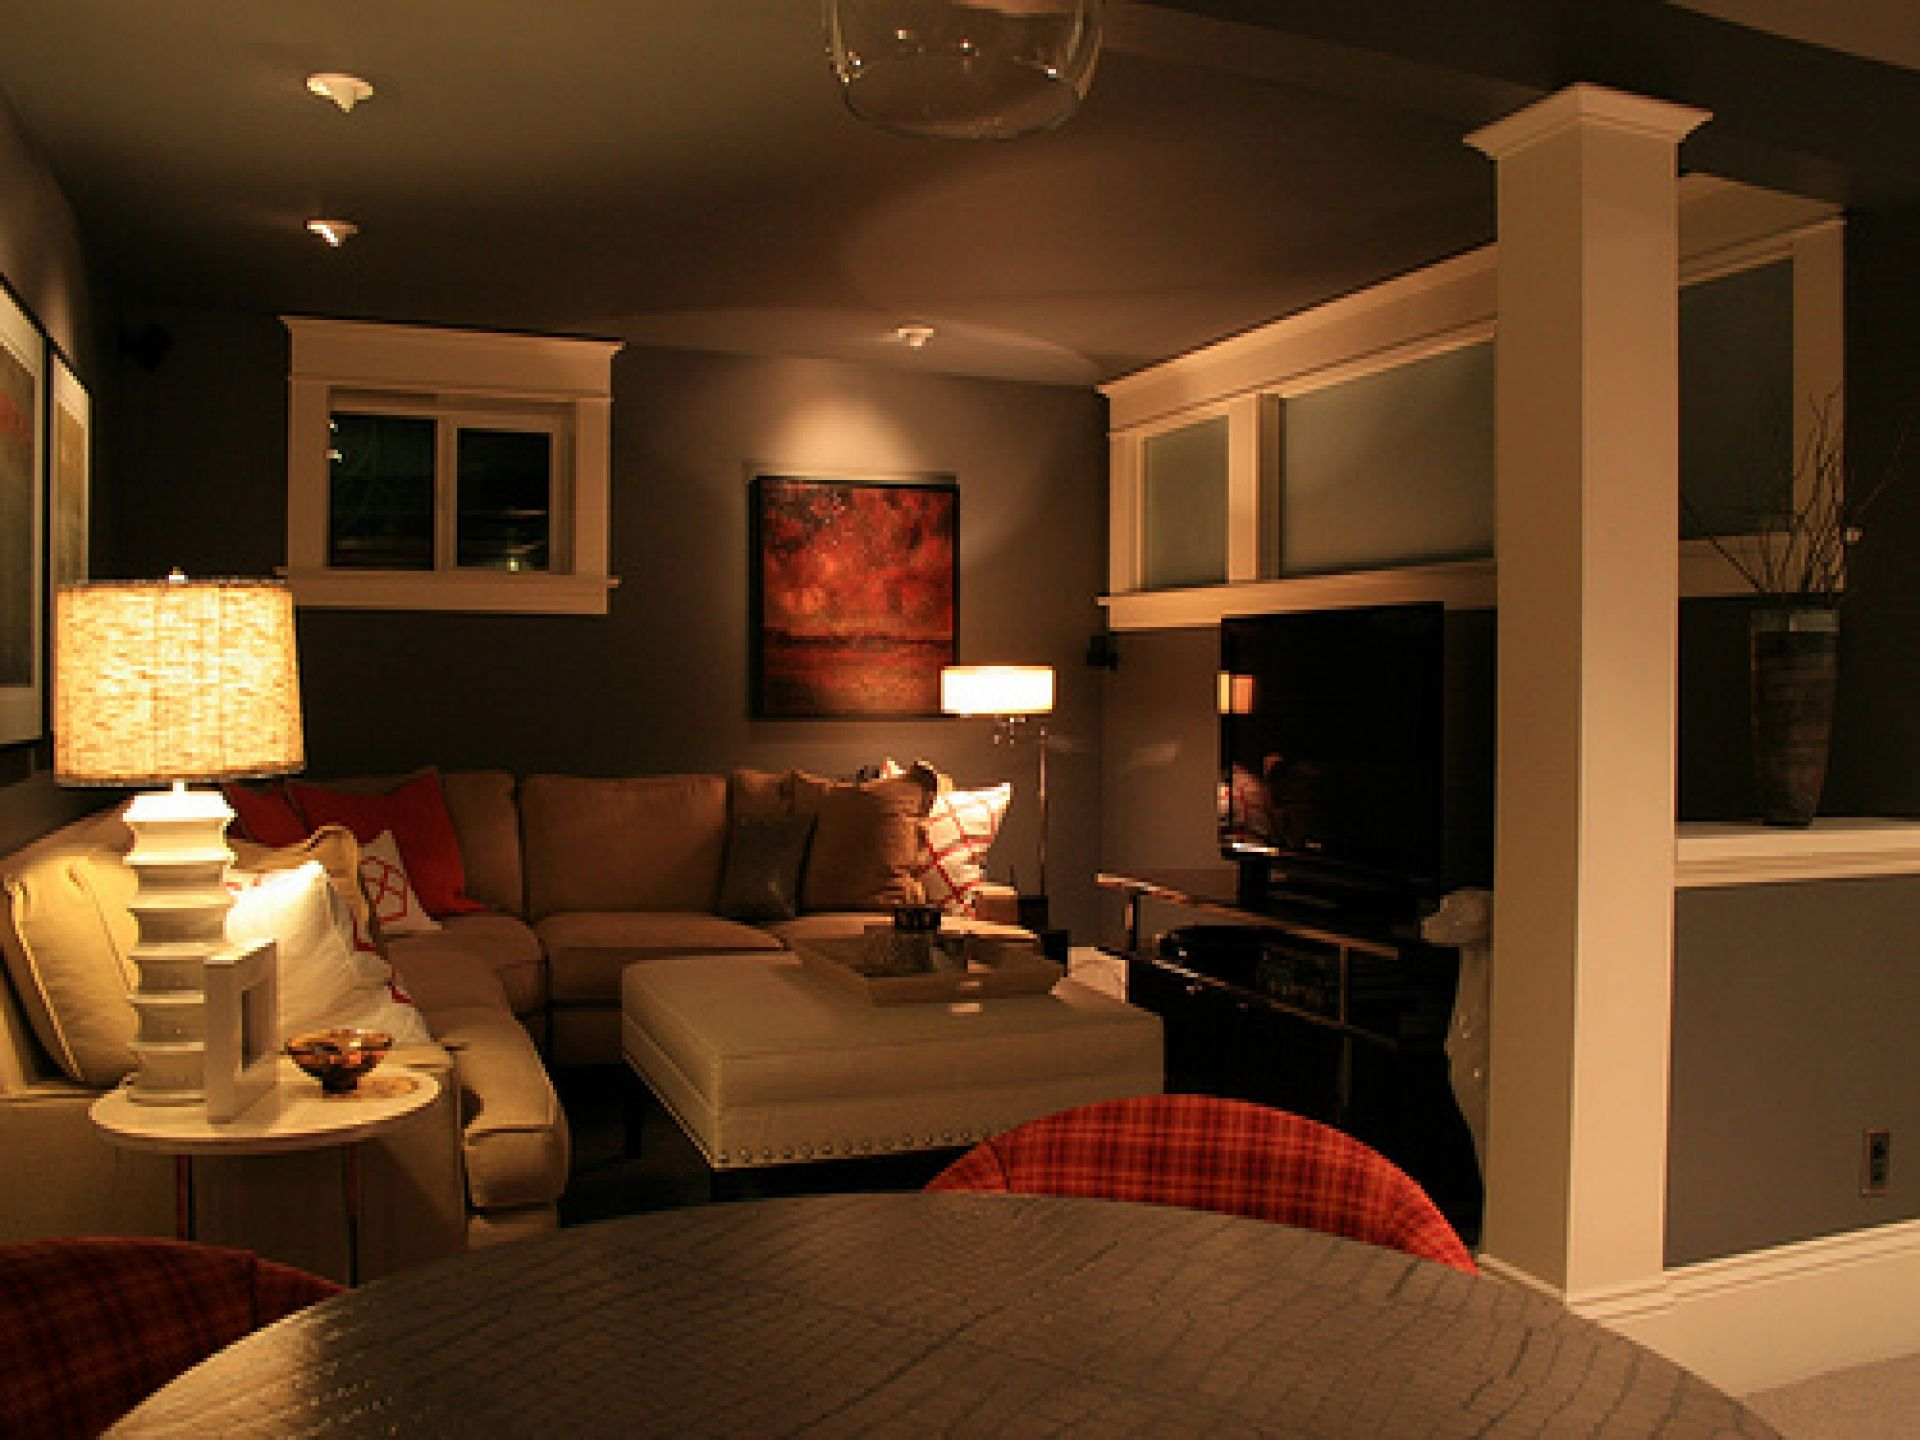 Basement Bedroom Ideas Romantic Home Cozy Basement Home Decor